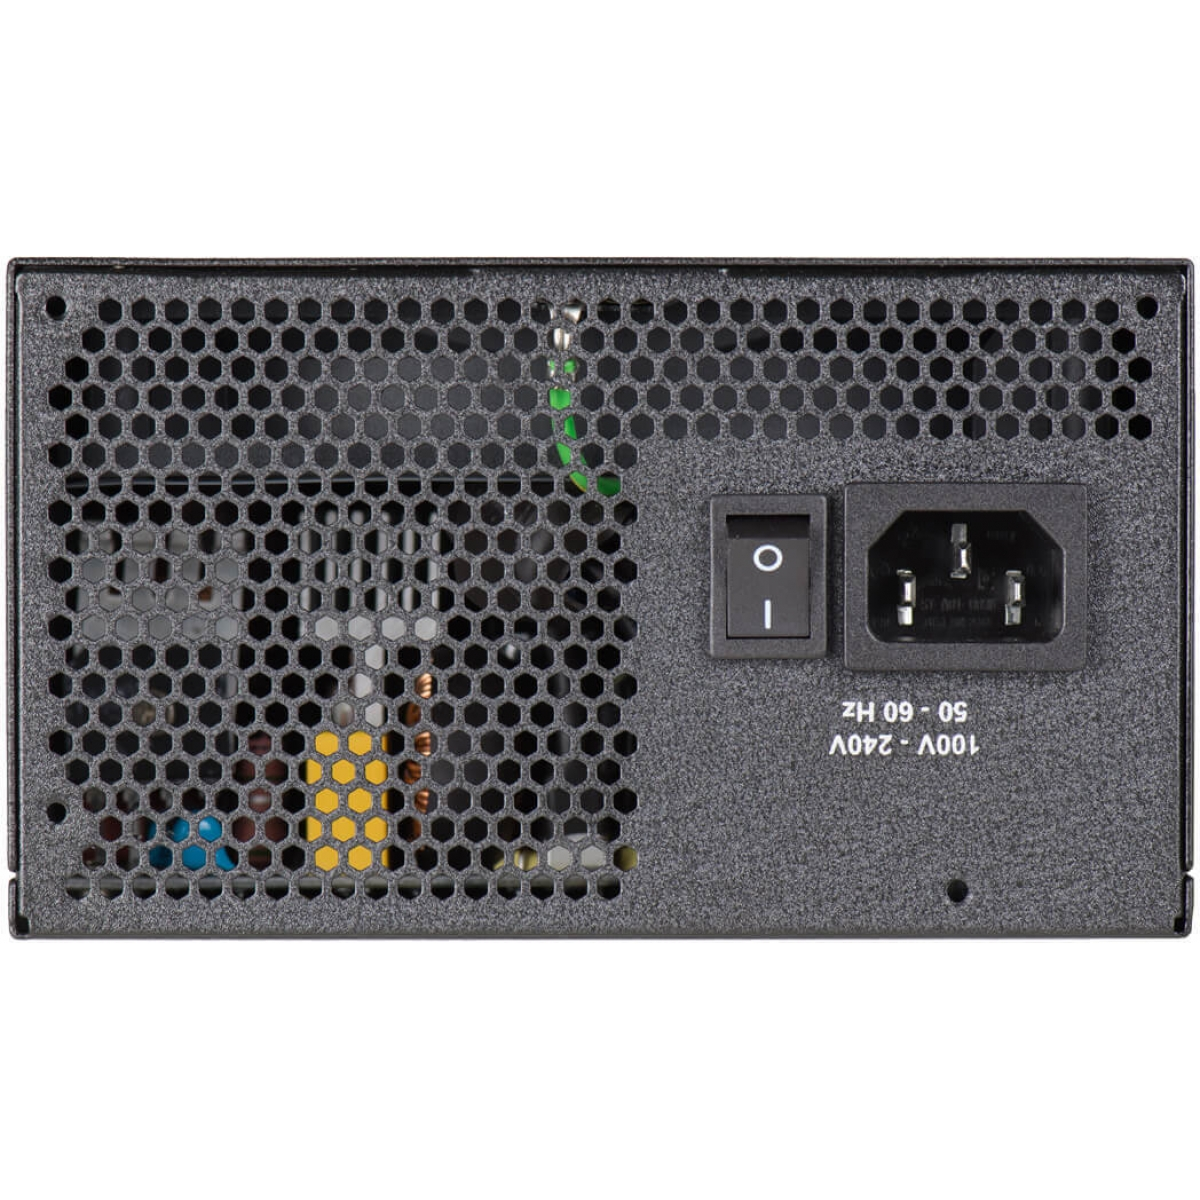 Fonte EVGA 850 BQ 850W, 80 Plus Bronze, Semi Modular, PFC Ativo, 110-BQ-0850-V1